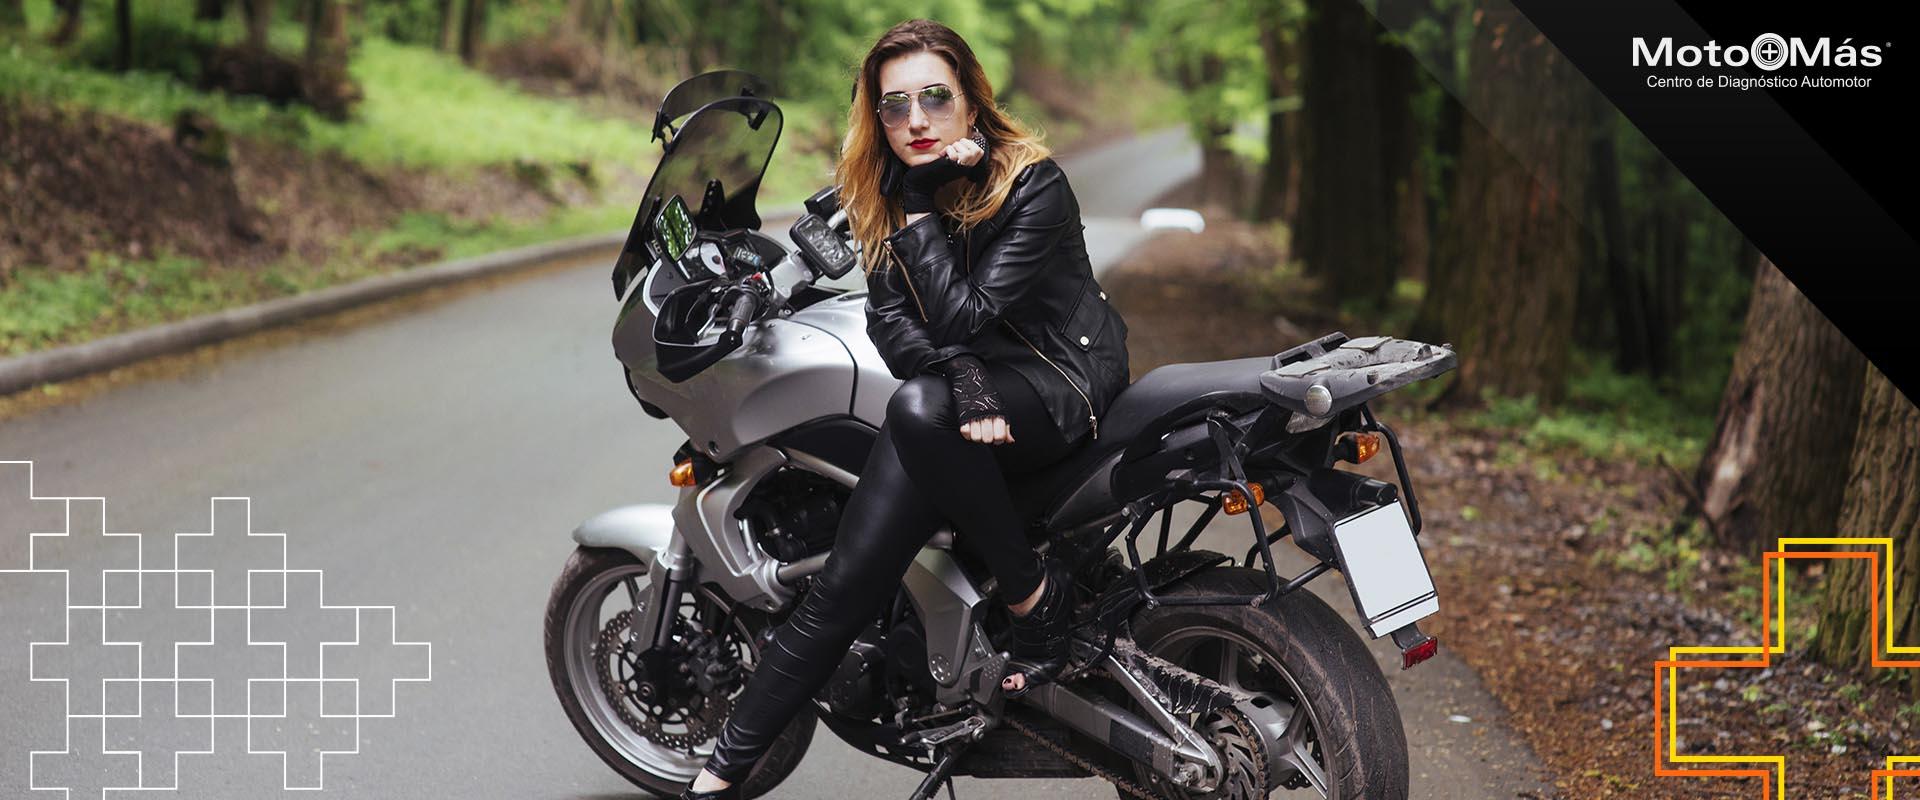 Consejos para elegir la moto ideal según tu estatura